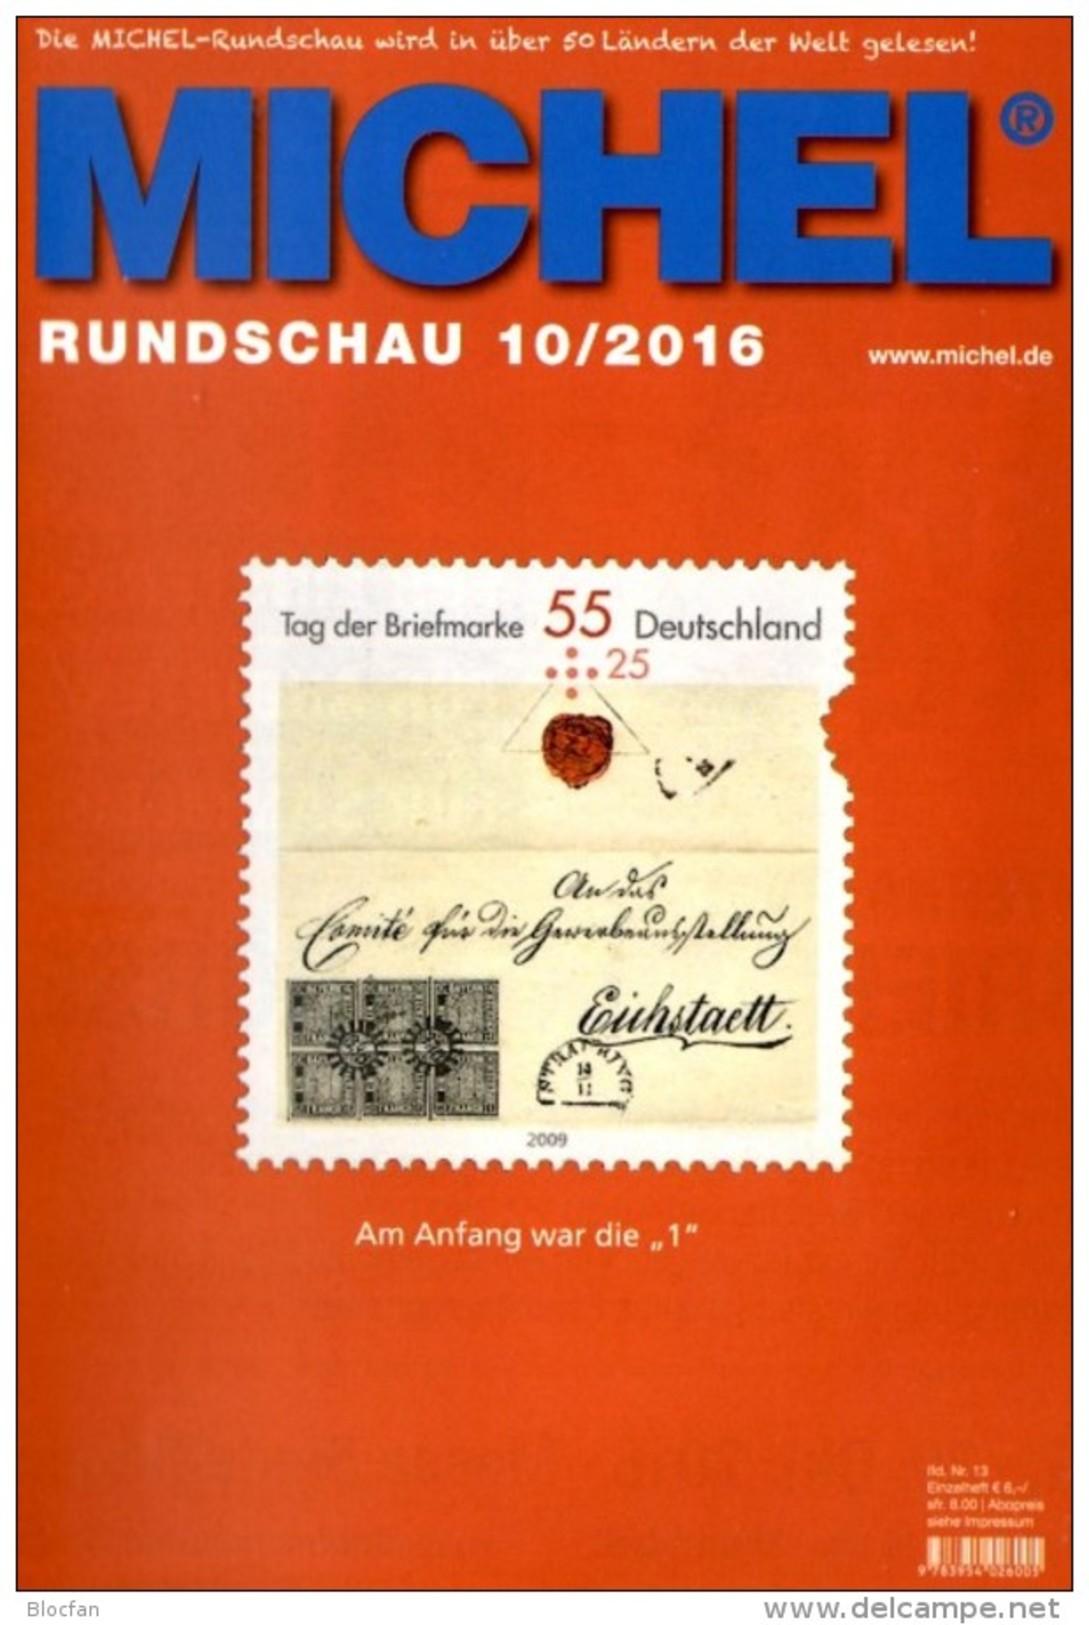 Briefmarken Rundschau MICHEL 10/2016 Neu 6€ New Stamp Of The World Catalogue/magacine Of Germany ISBN 9783954026005 - Libros, Revistas, Cómics